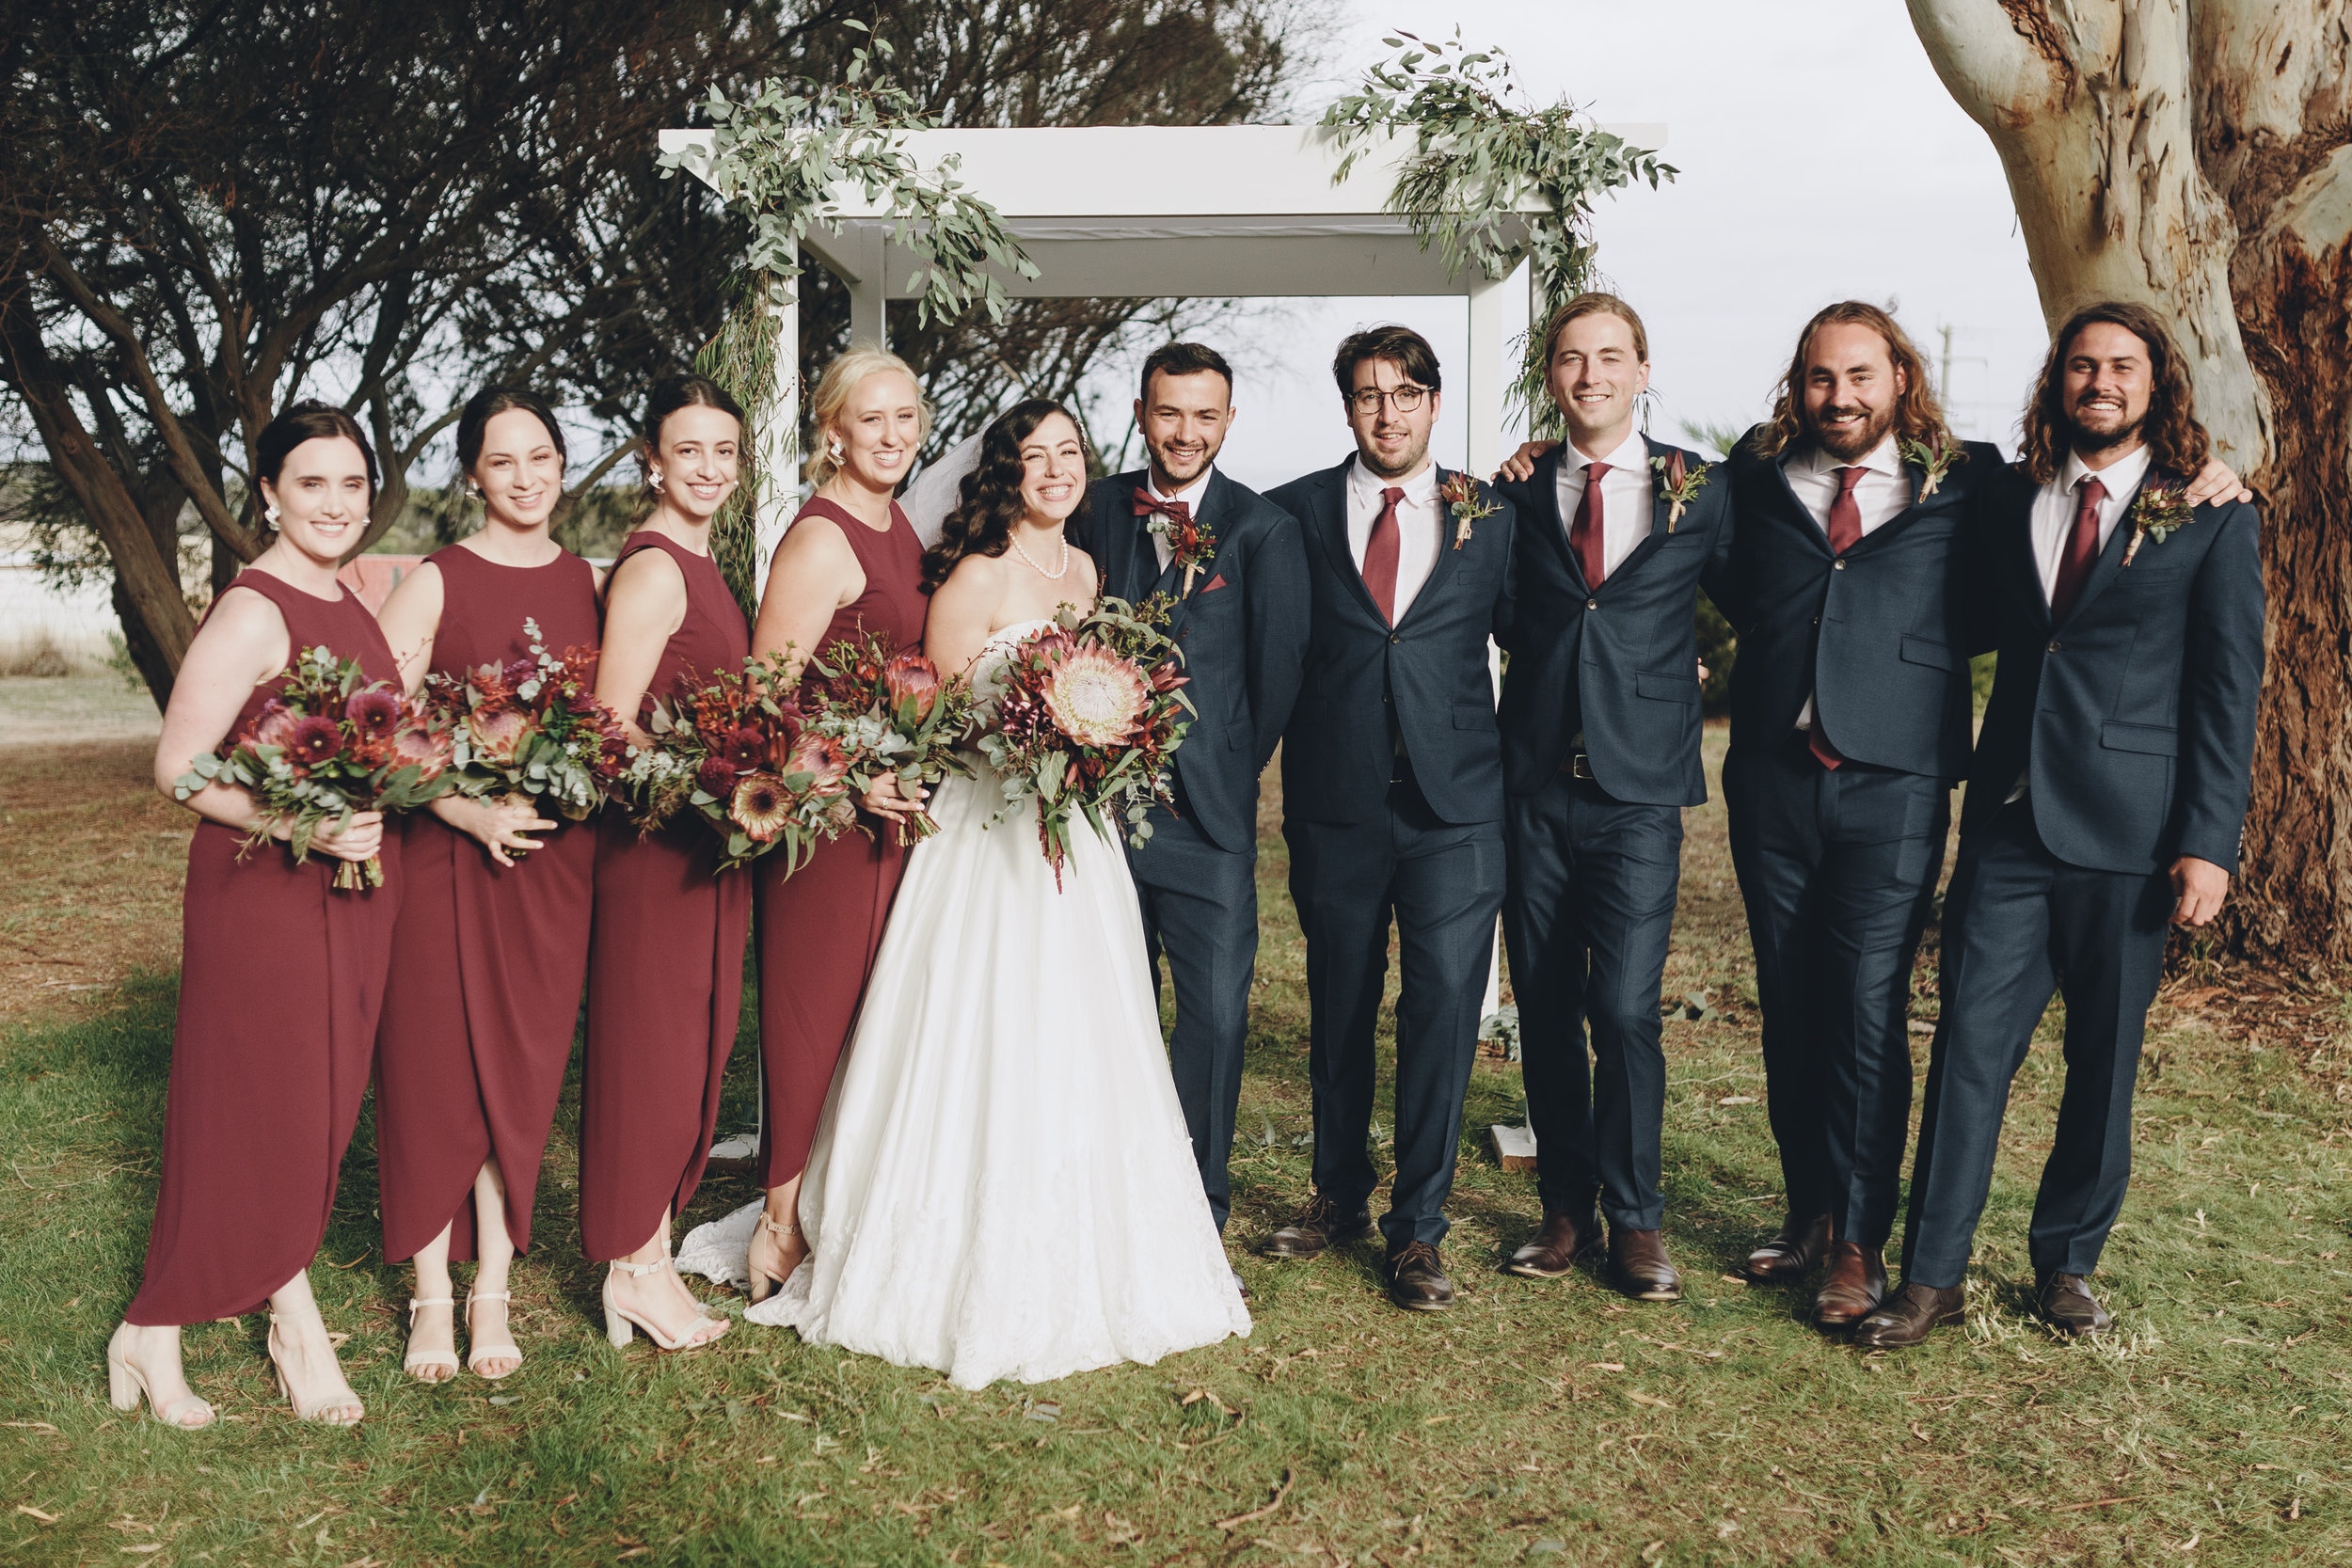 Wedding_Party-30.jpg